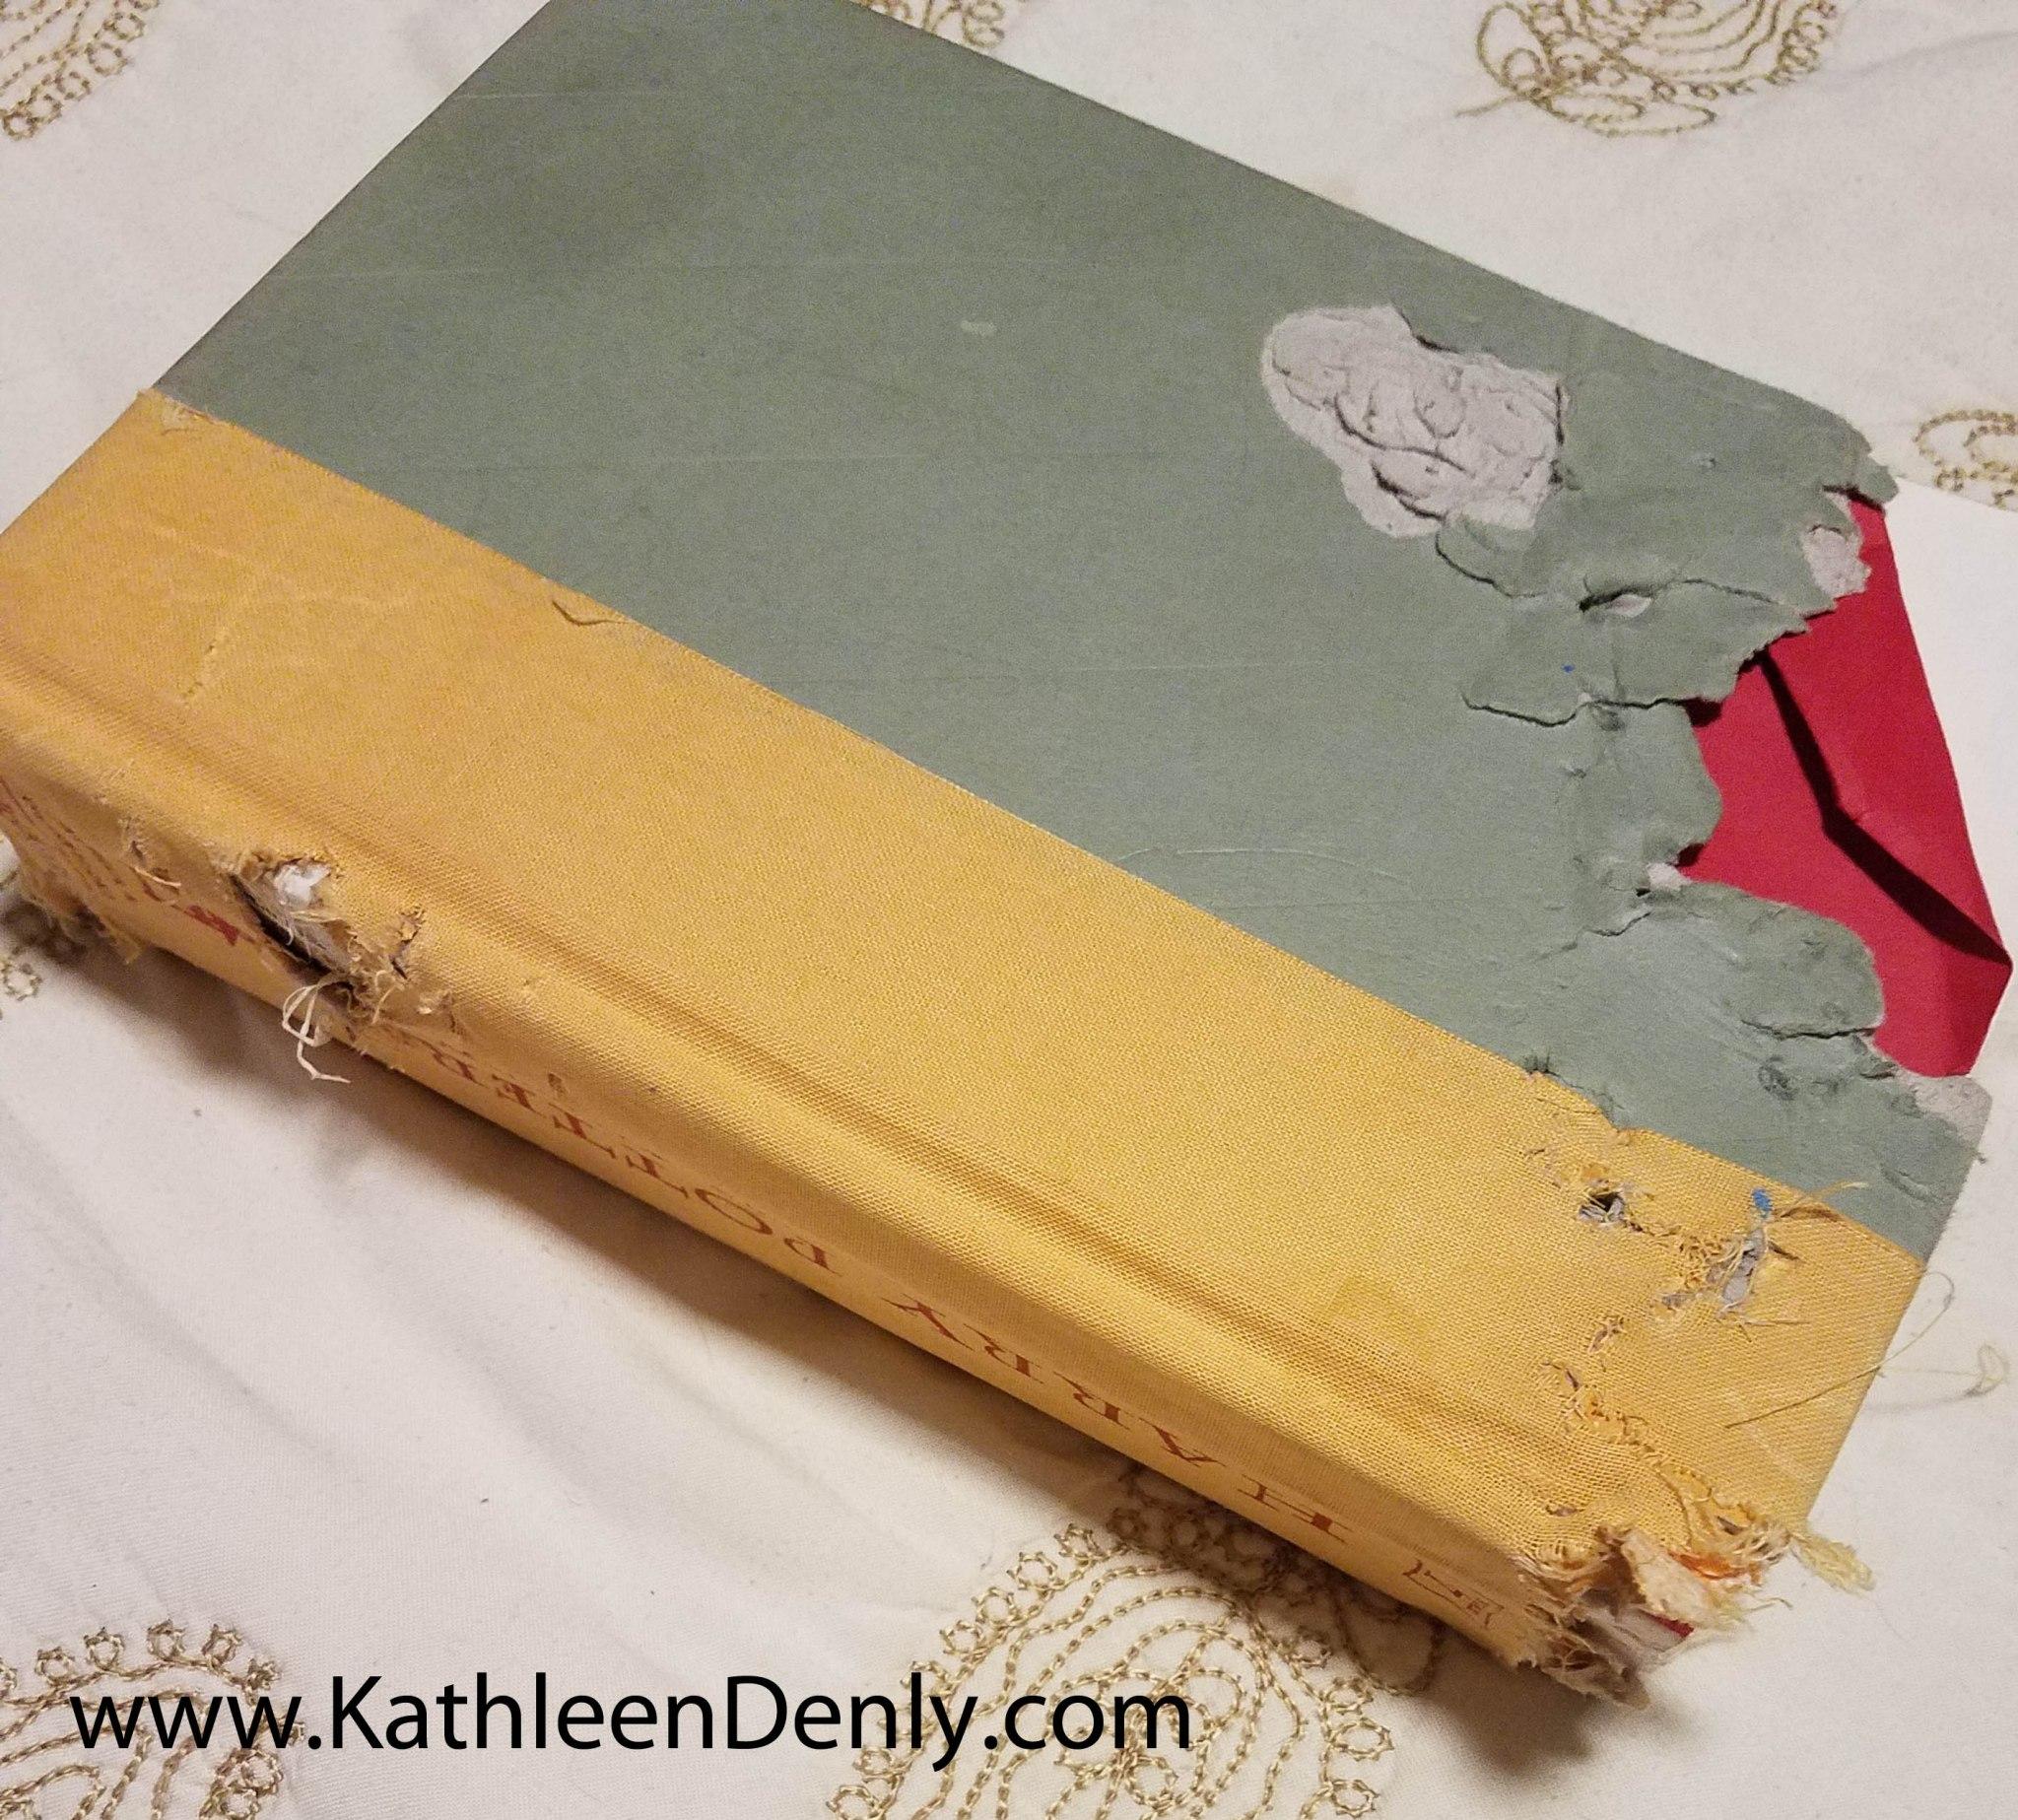 Animal Chewed Book